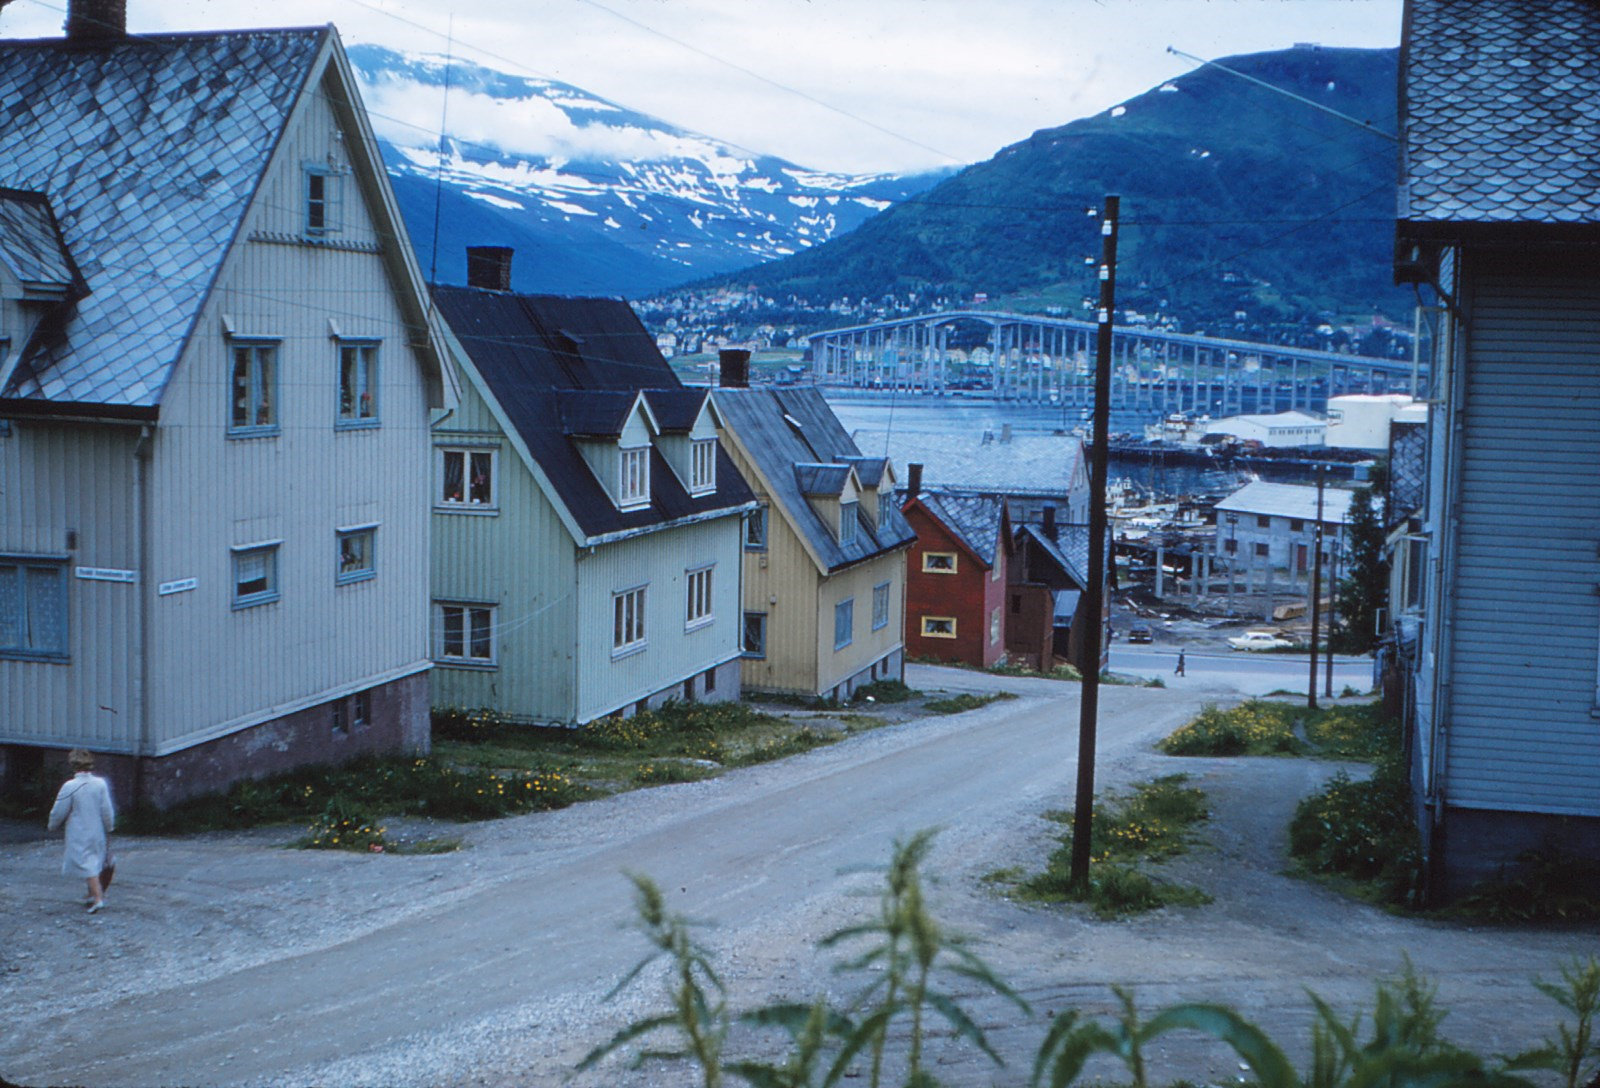 881 (30) Tromsø, hooggelegen brug op achtergrond. Straat